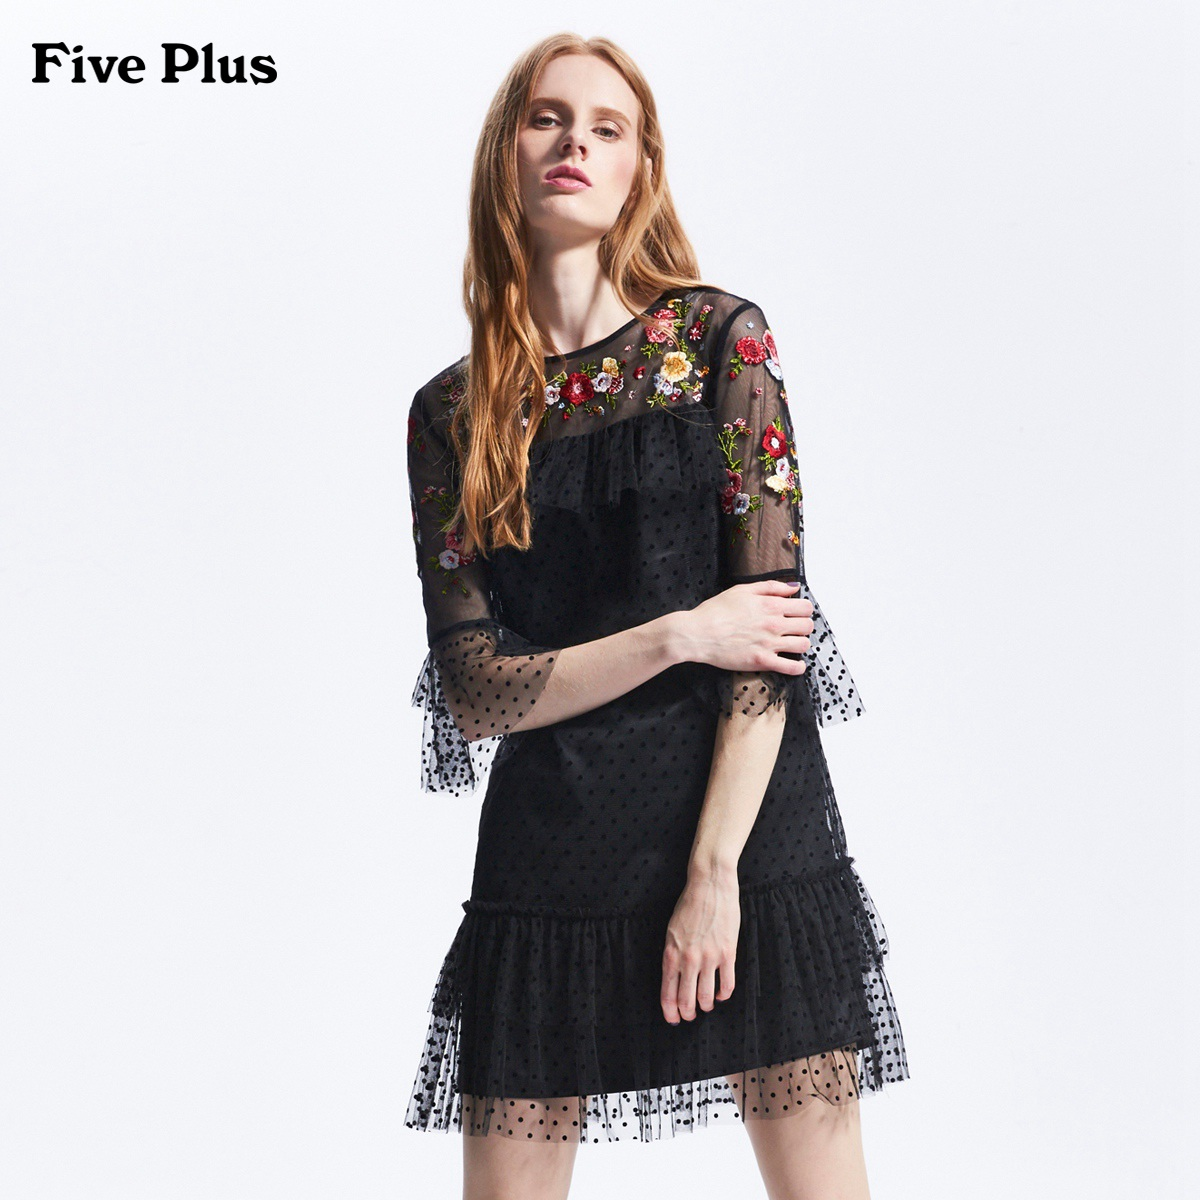 Five Plus2018新品女夏装中袖连衣裙宽松纱裙荷叶边刺绣图案圆点